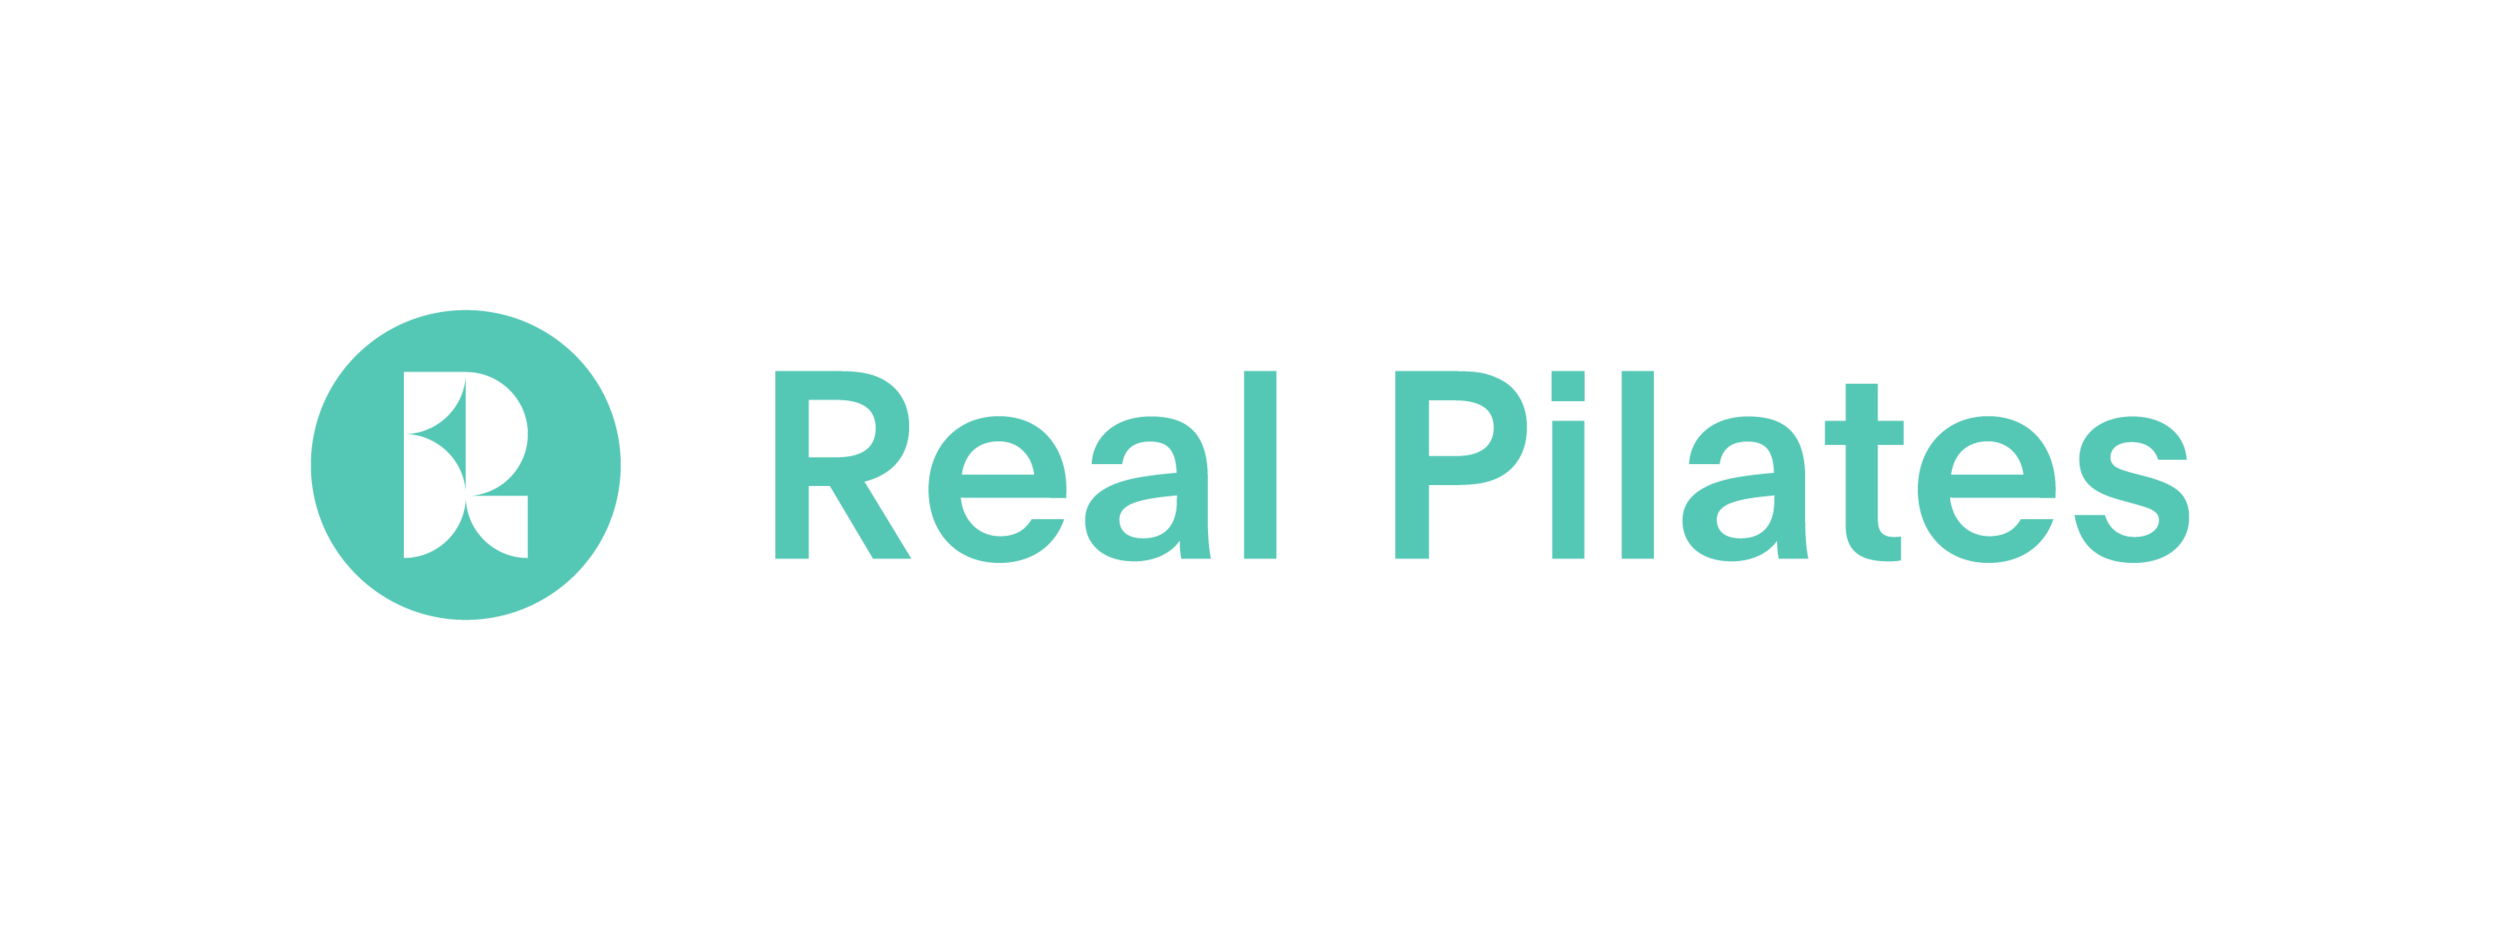 Real_Pilates_Logo_Horizontal_Color_Positive_RGB-01.png